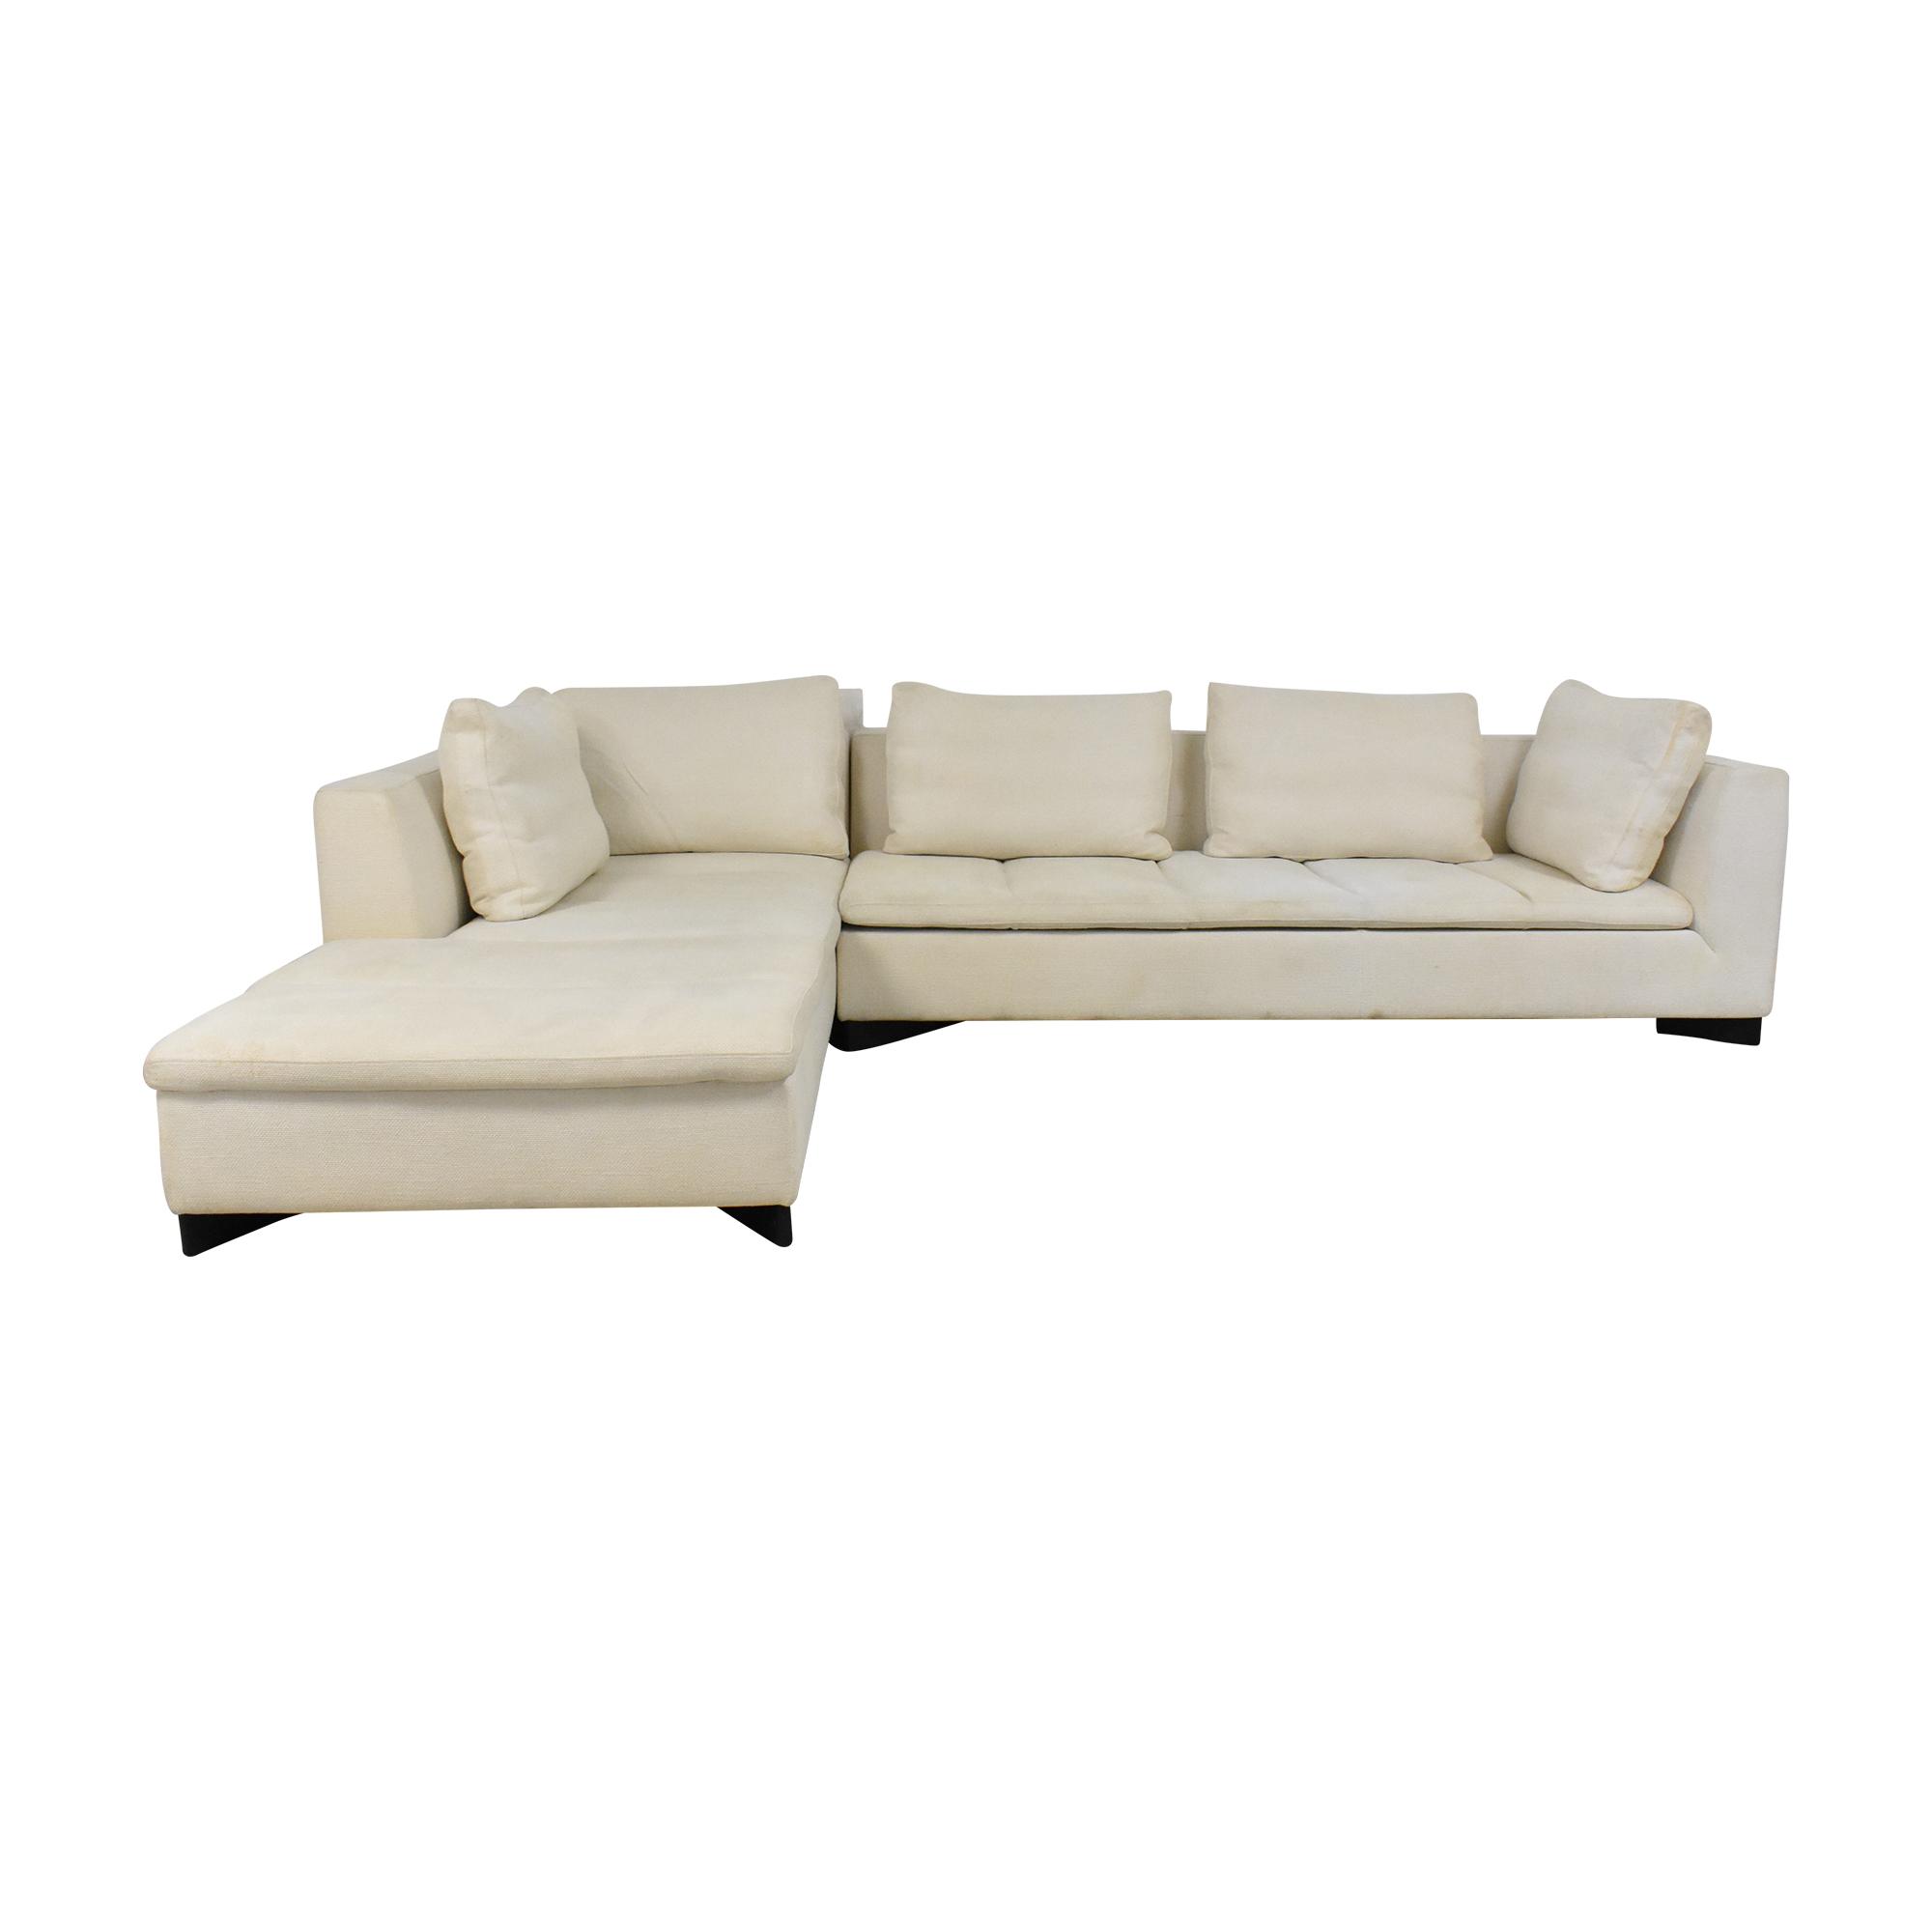 buy Ligne Roset Sectional Sofa with Chaise Ligne Roset Sofas